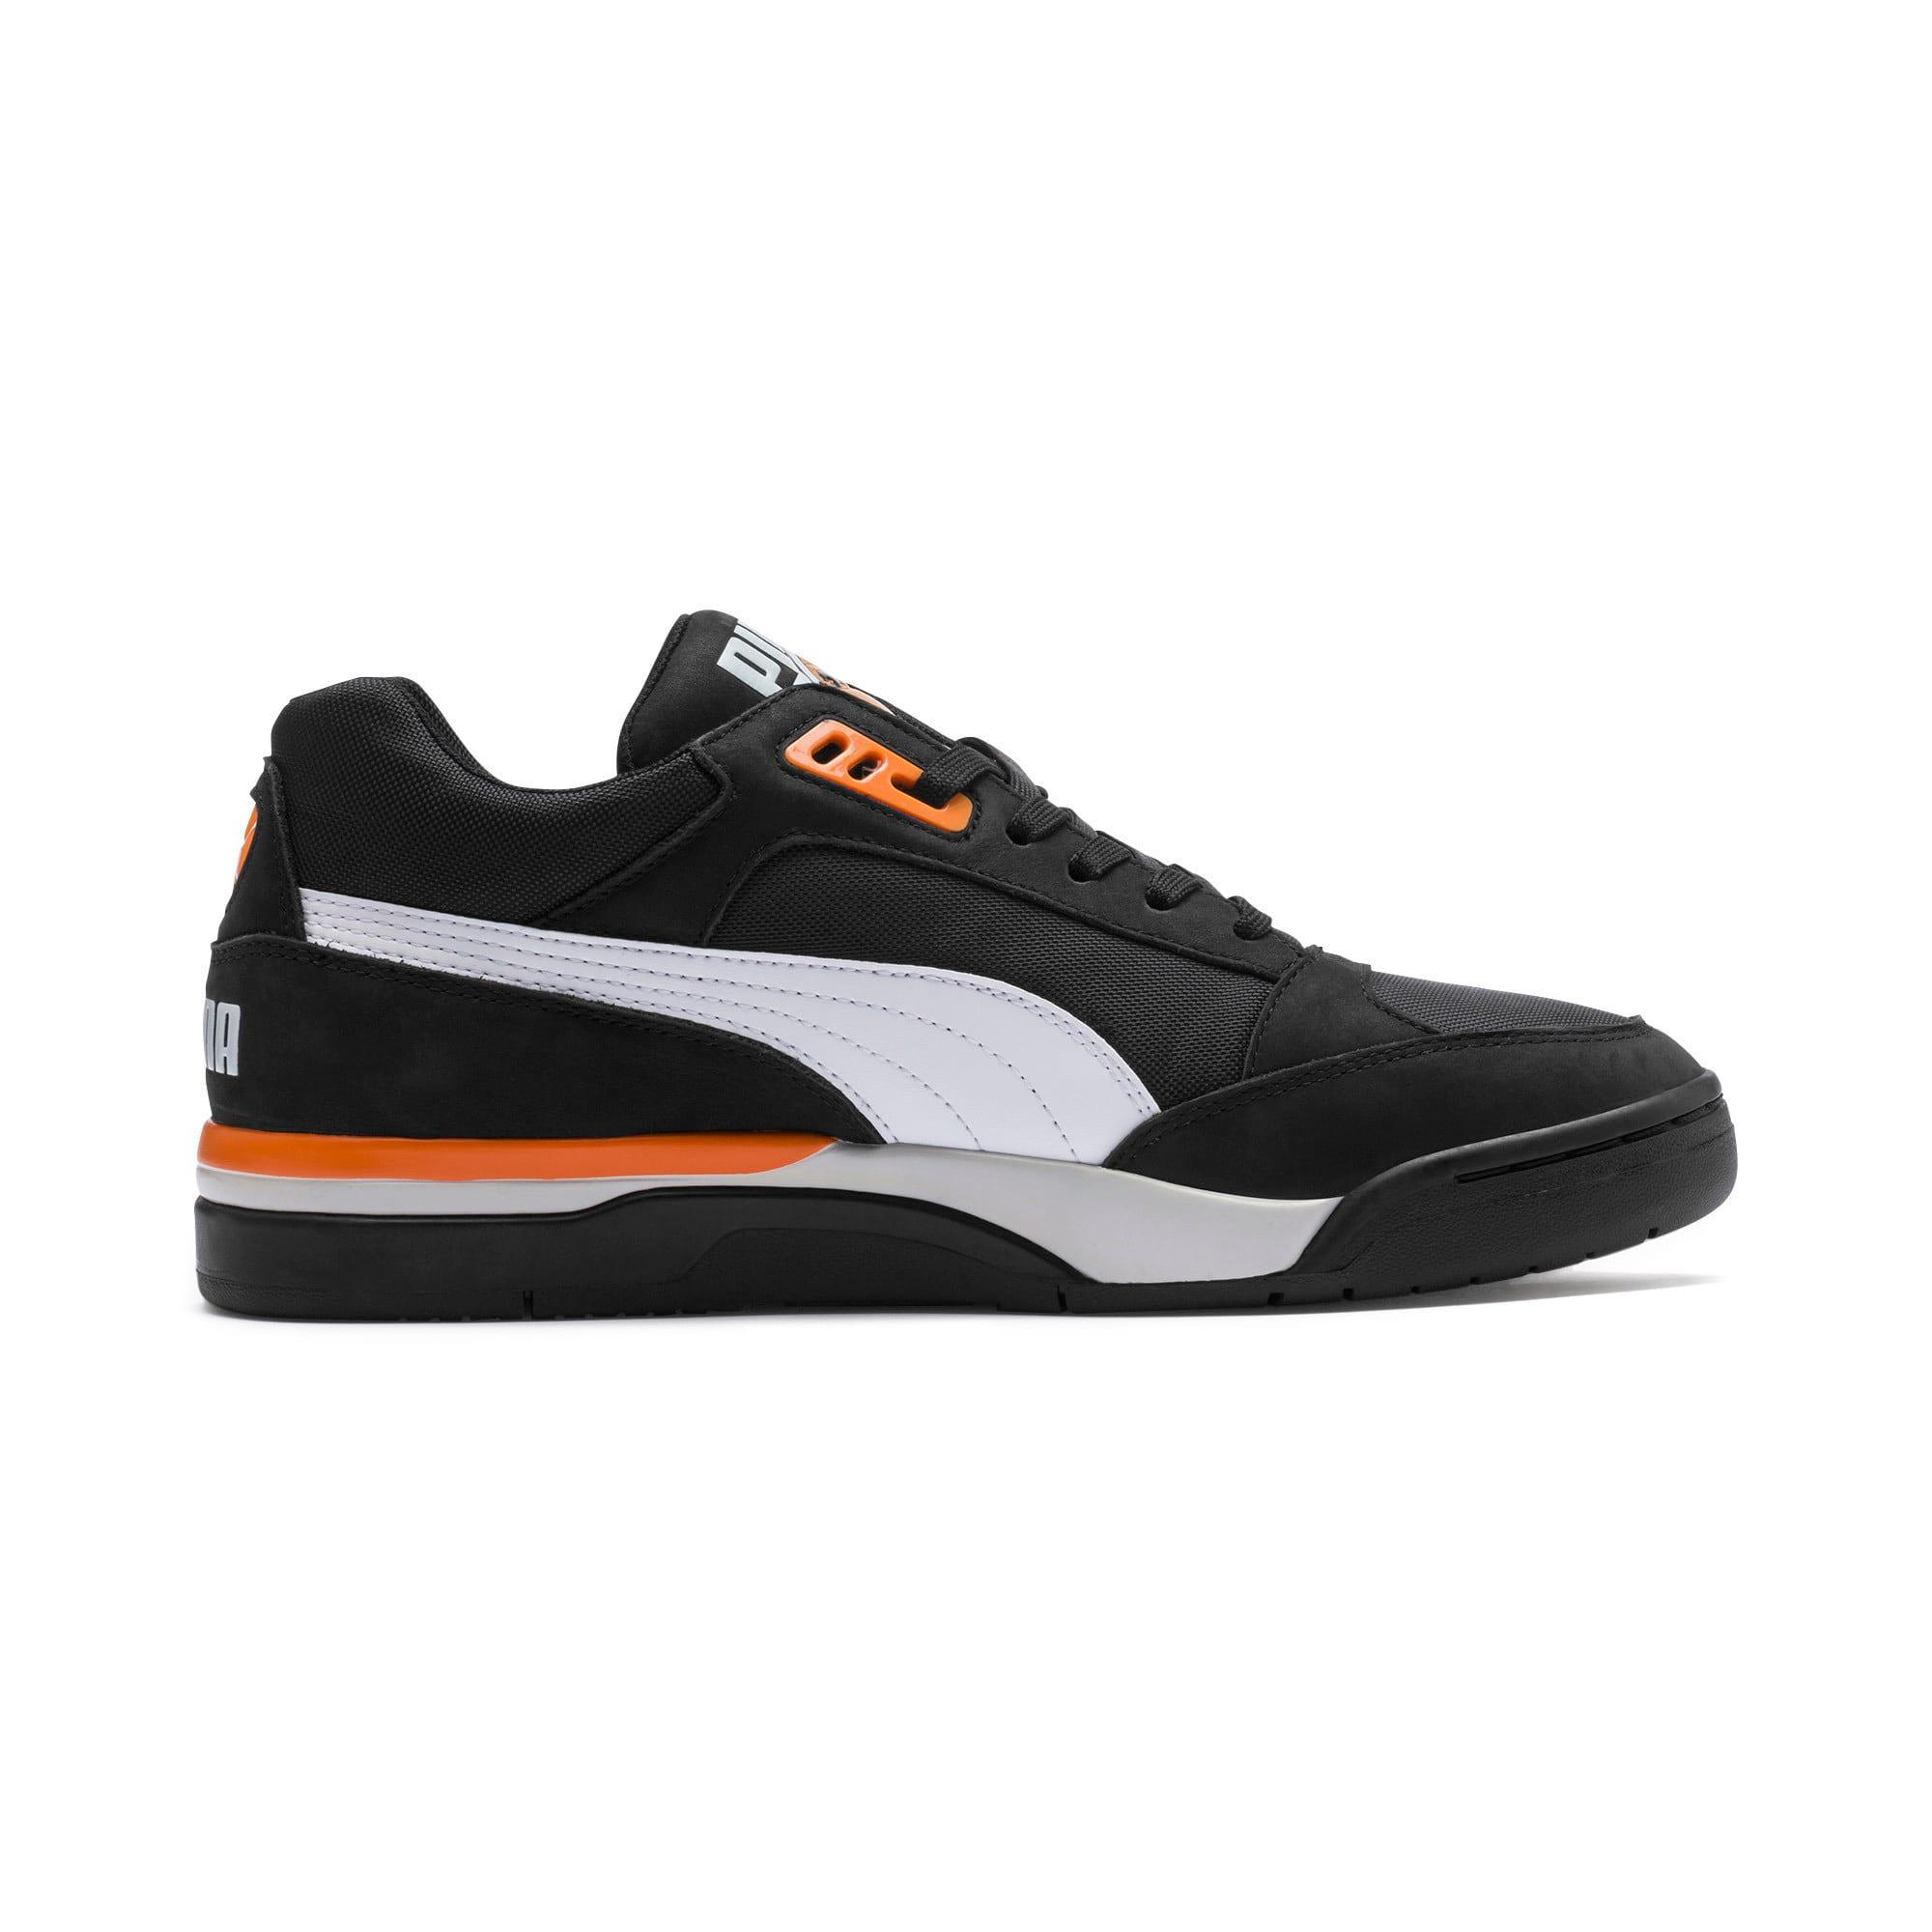 Thumbnail 5 of Palace Guard Bad Boys Sneaker, Puma Black-Puma White-, medium